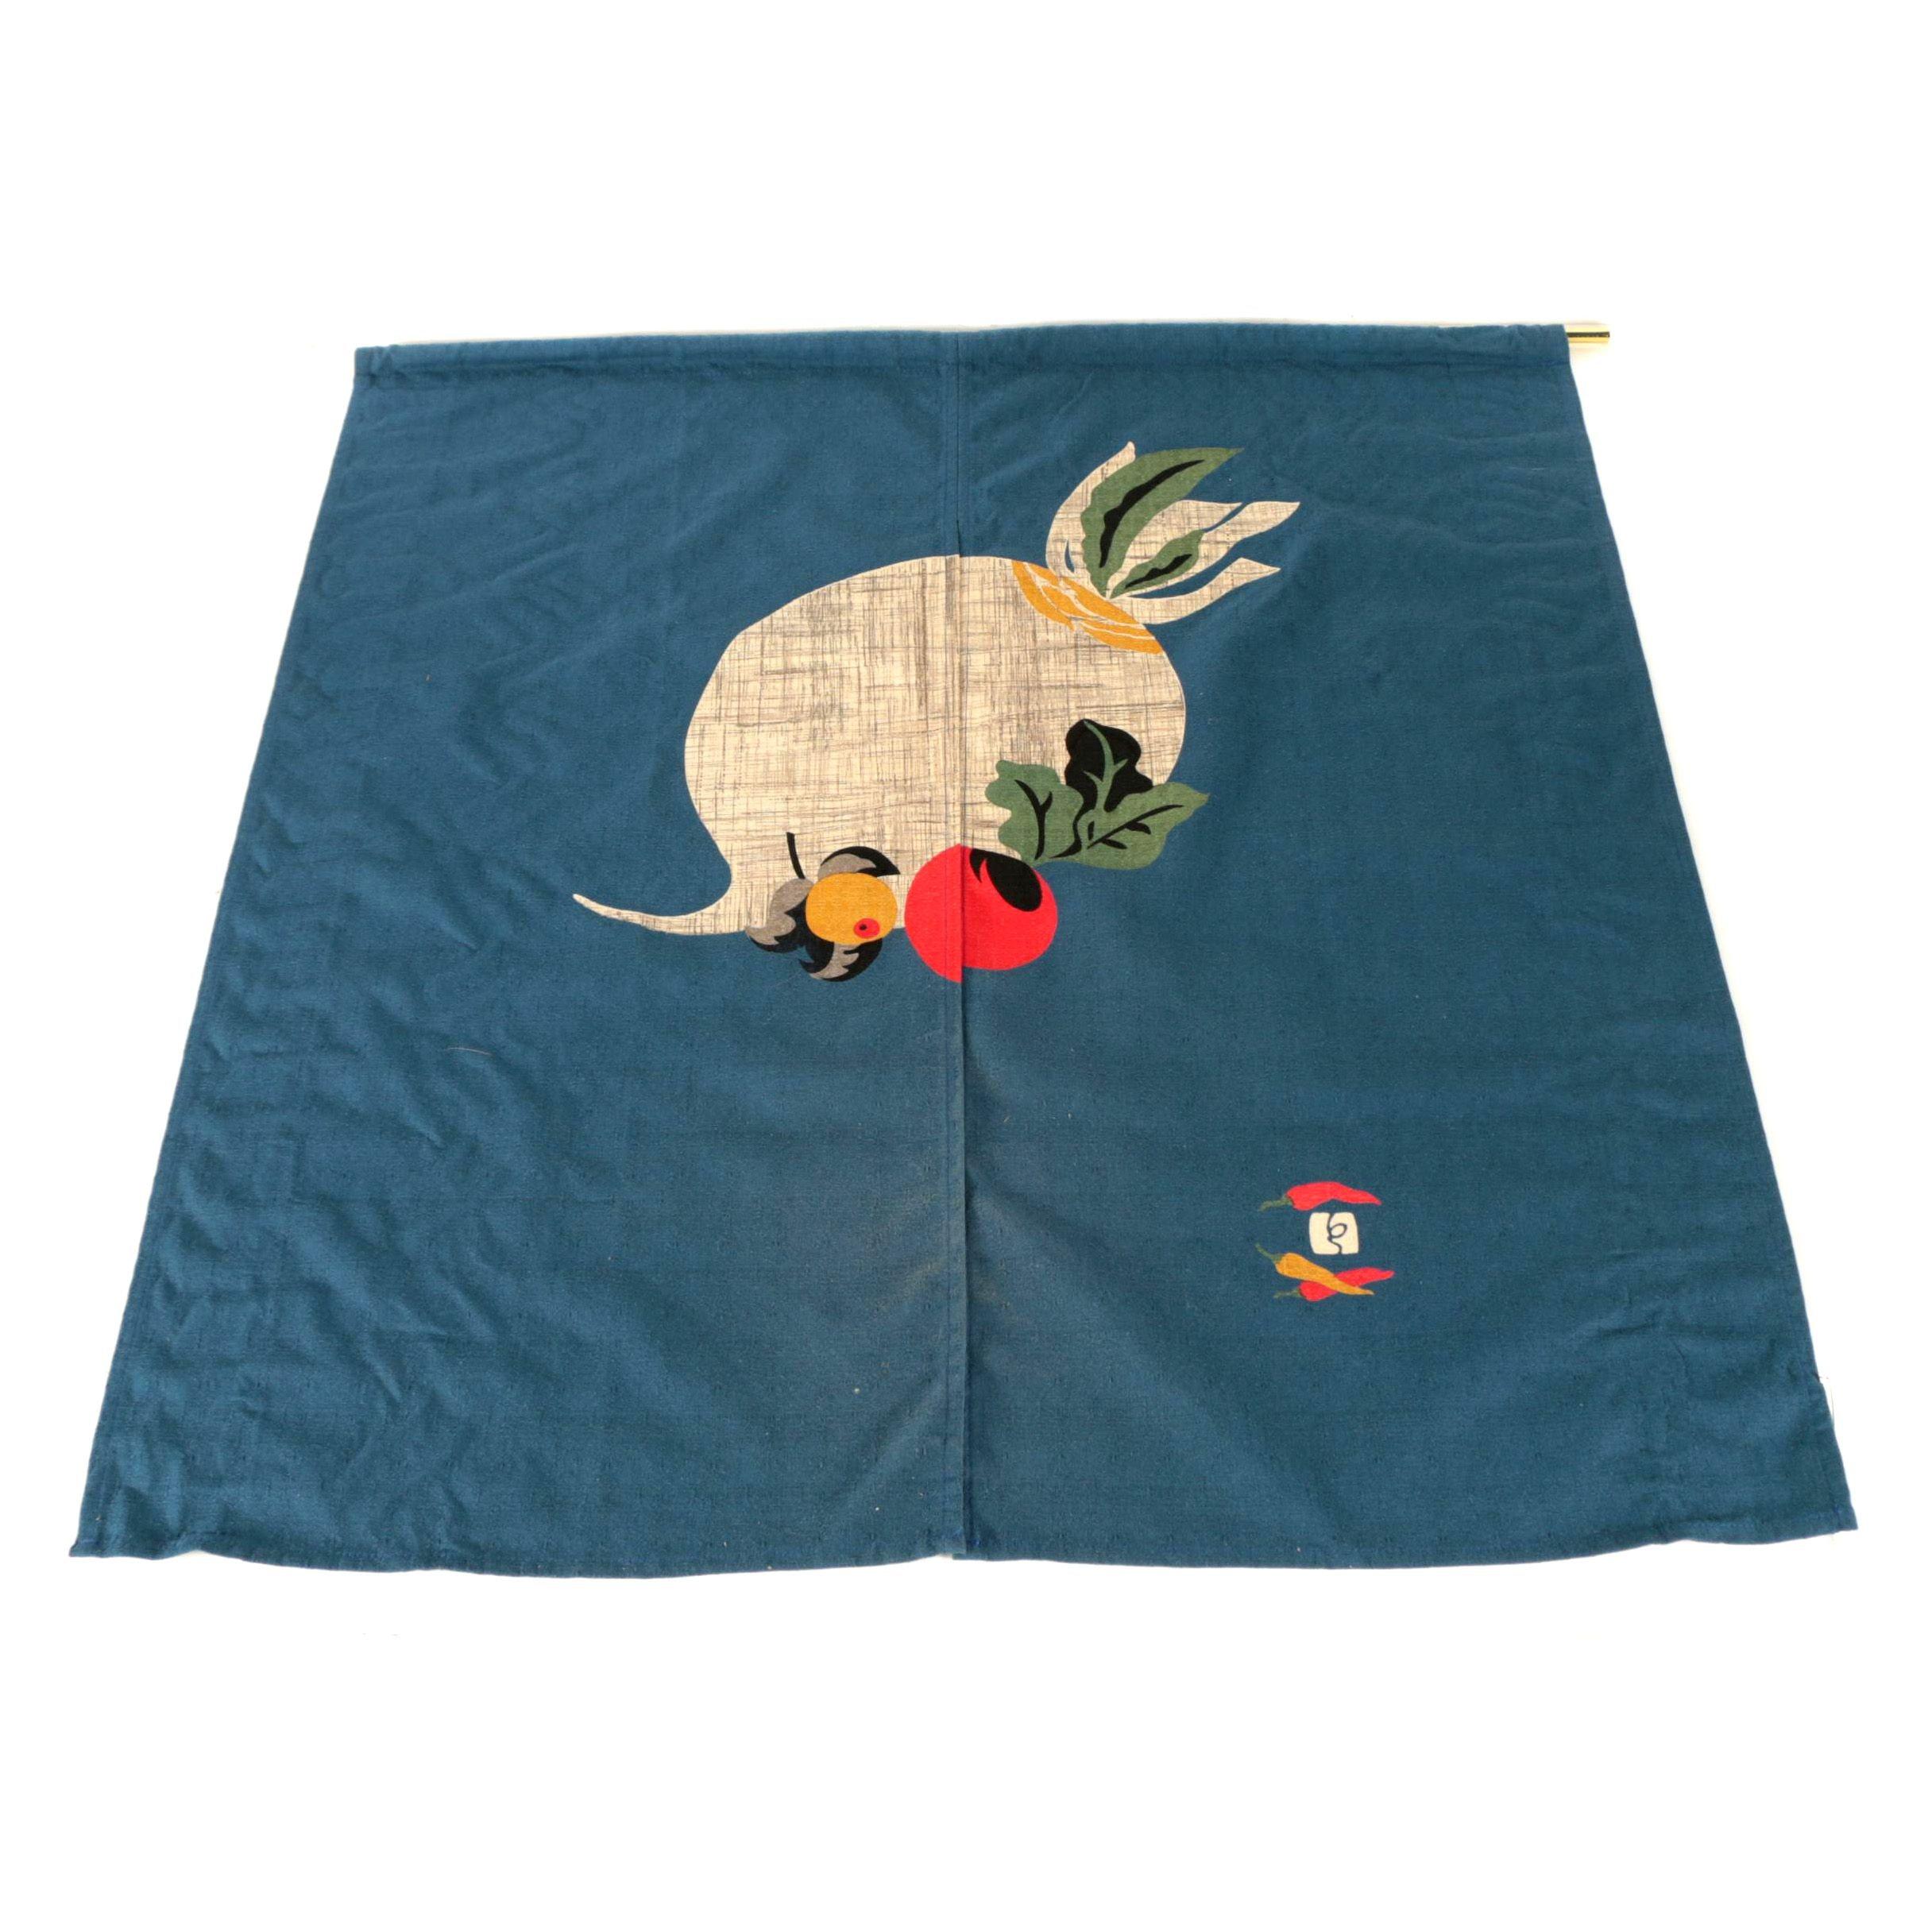 Japanese Linen Doorway Curtain